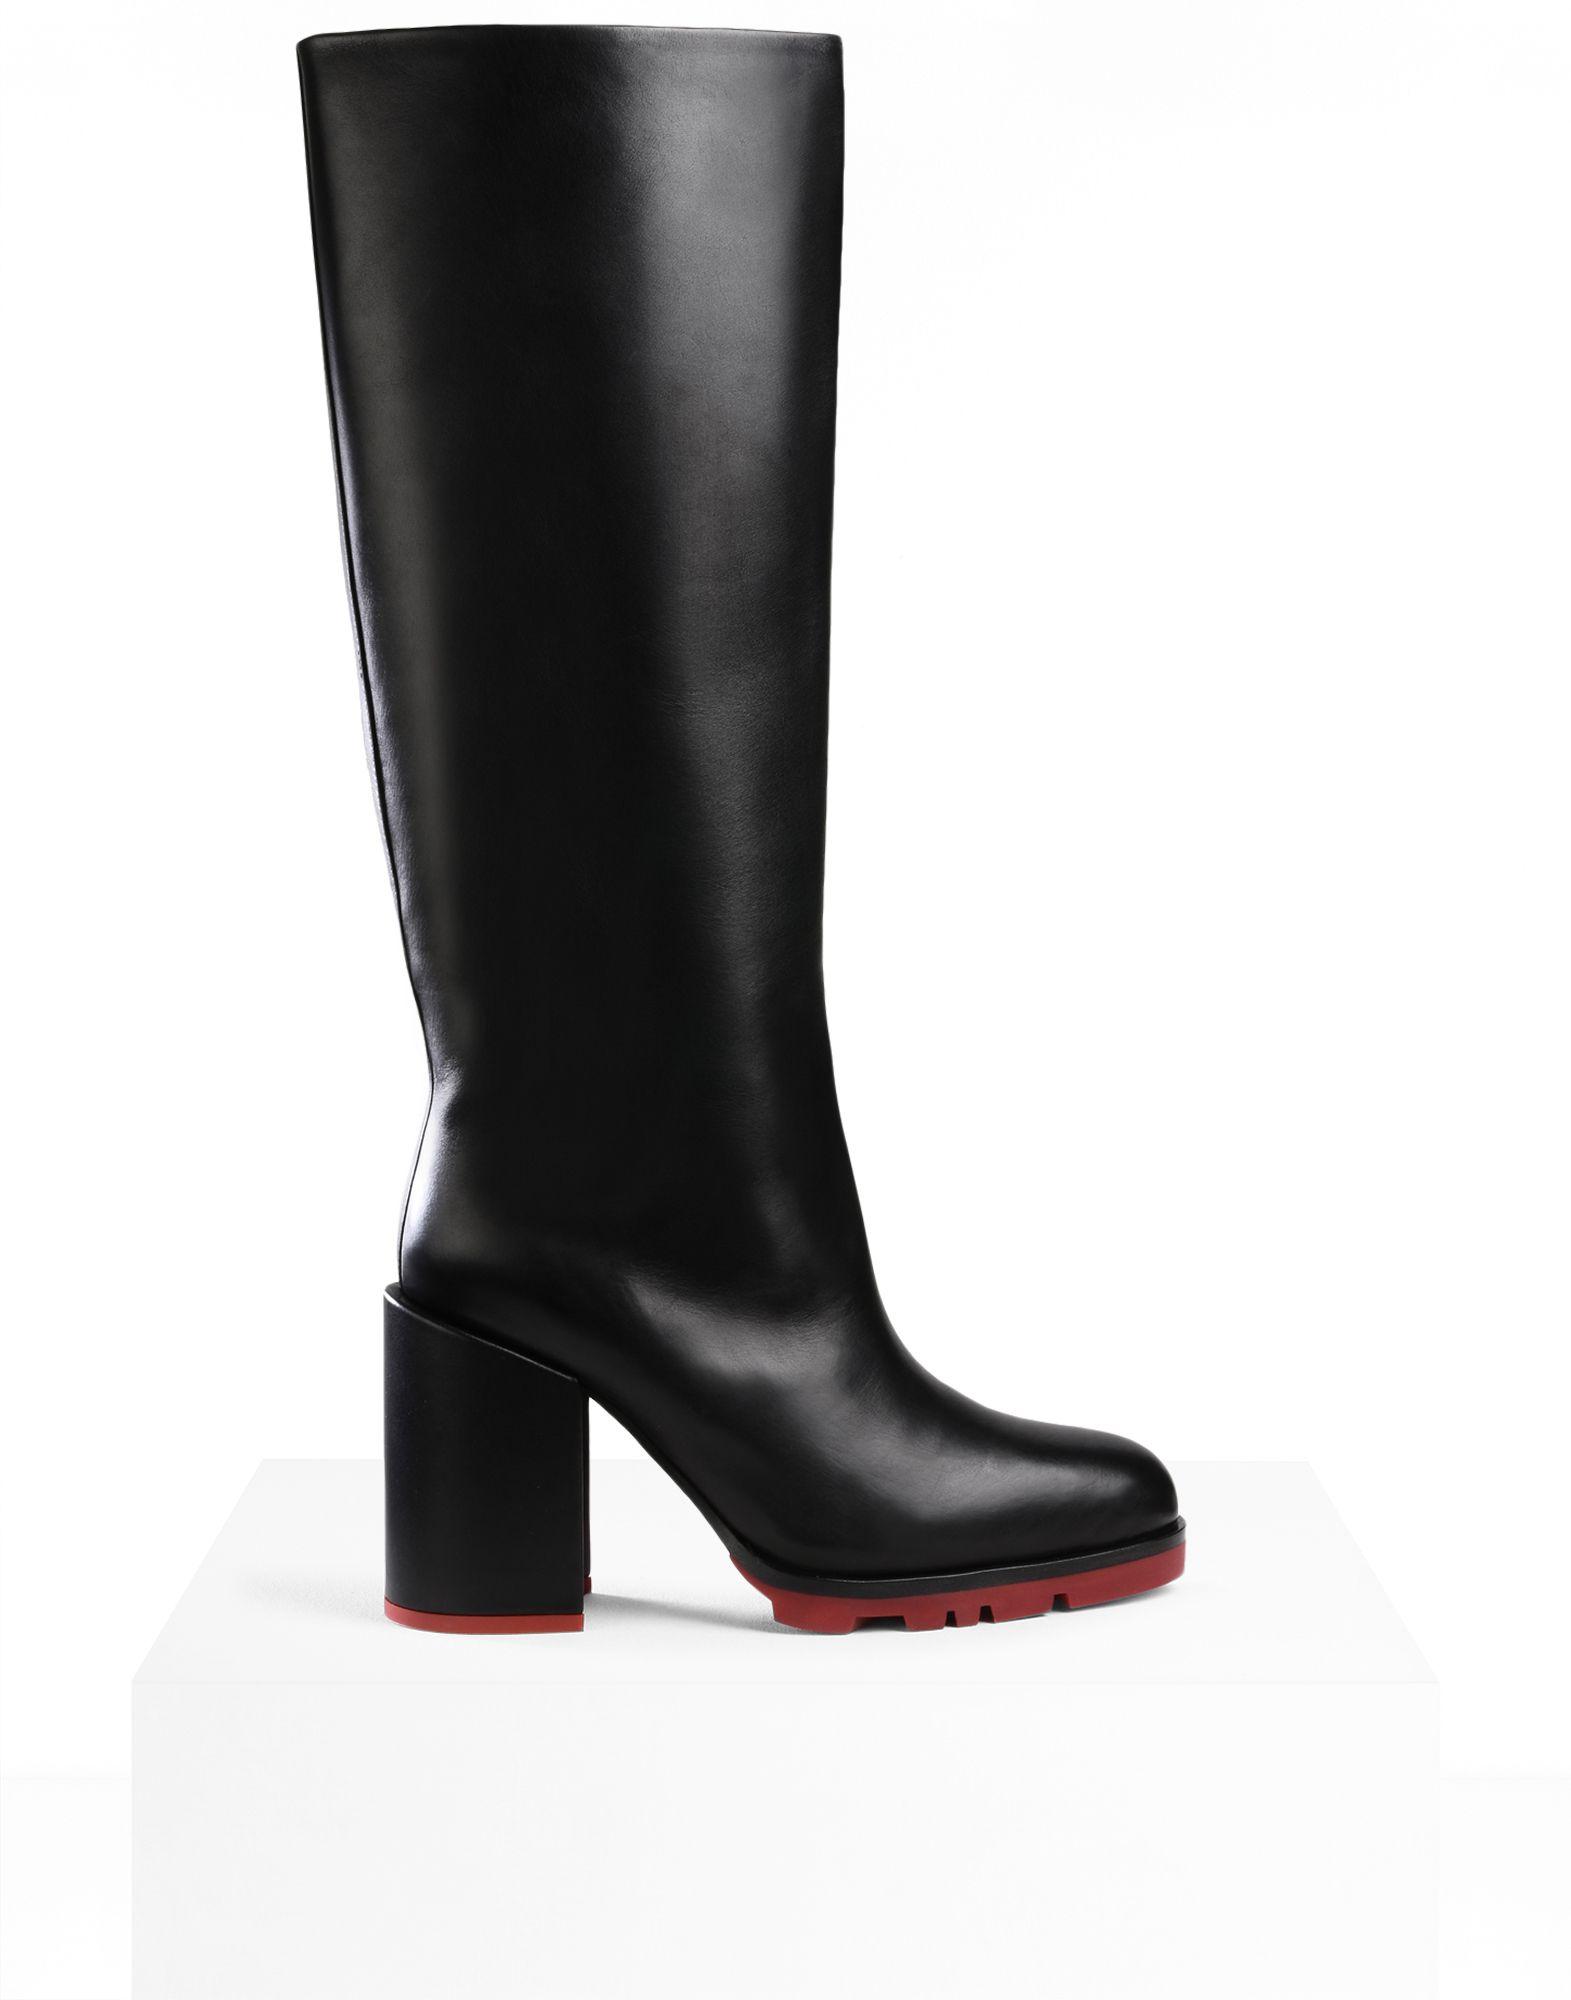 Boots - JIL SANDER Online Store